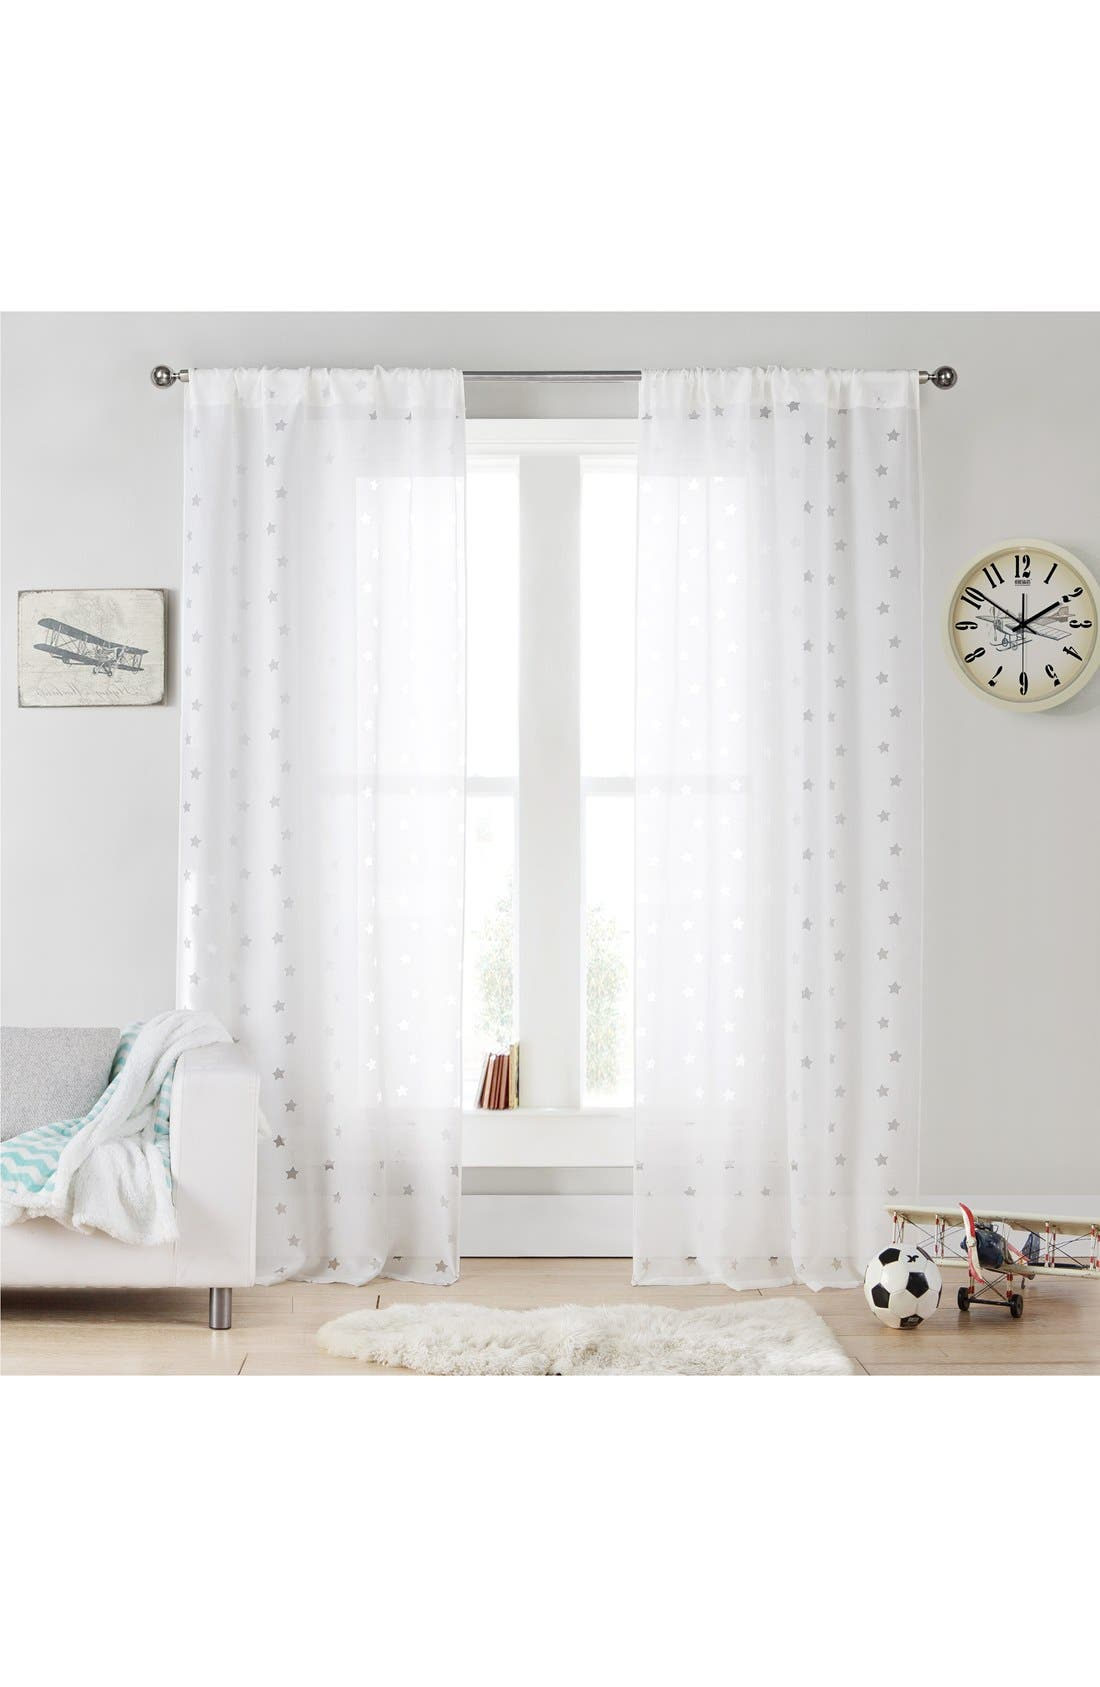 Main Image - LALA + BASH 'Gruden' Sheer Window Panels